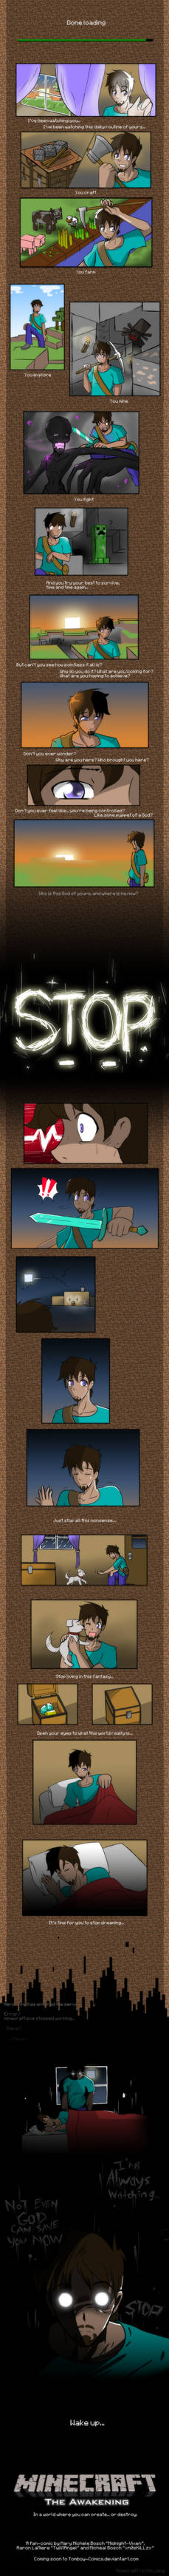 Minecraft Comic Teaser